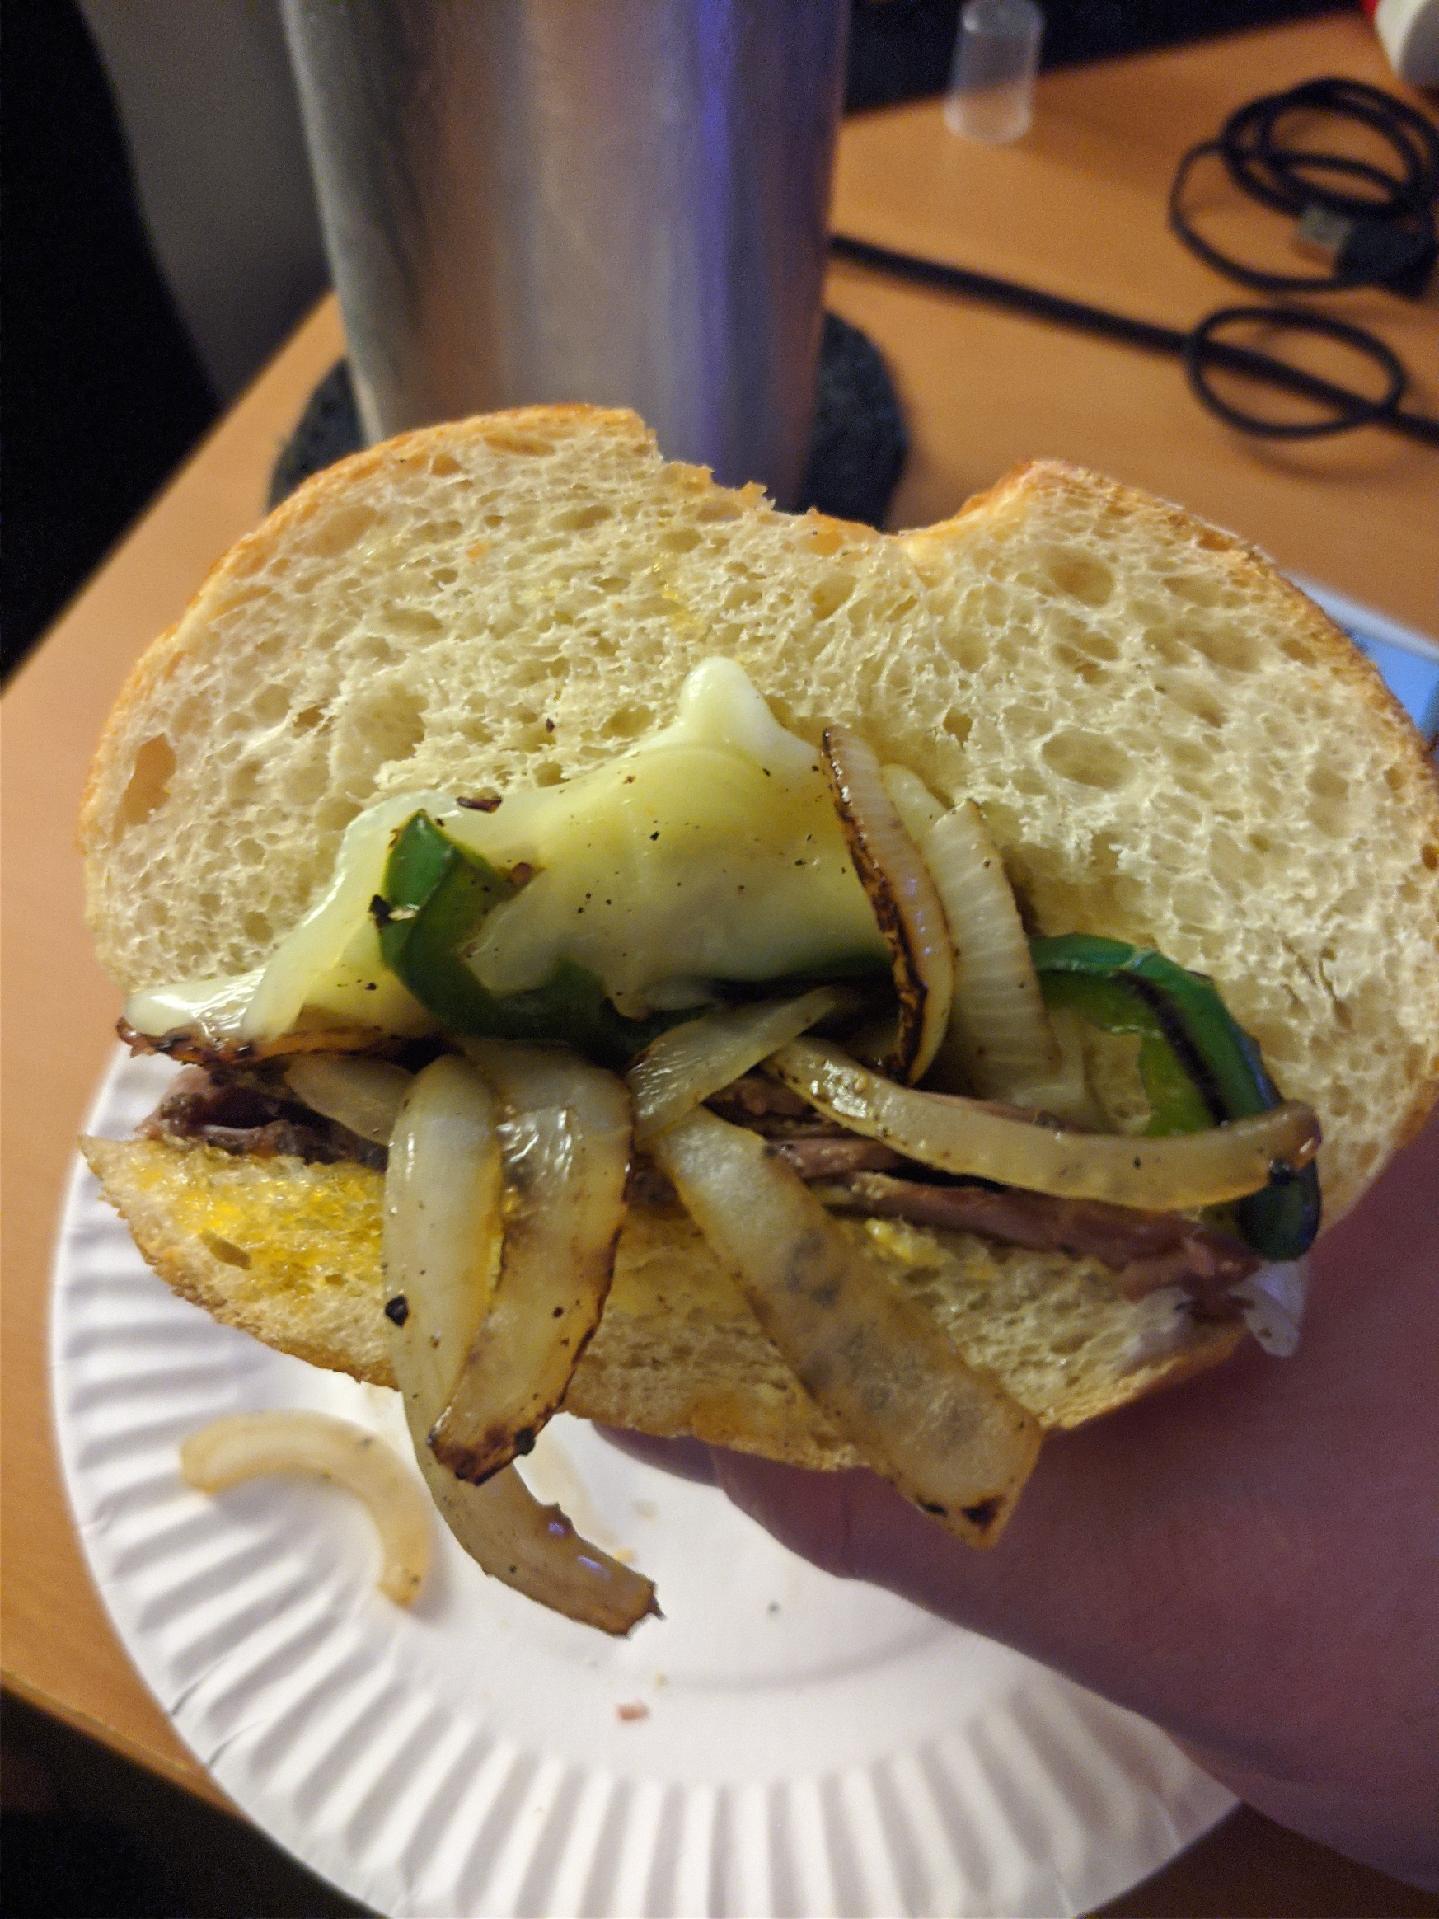 Manwiches-alxfwpw-jpg